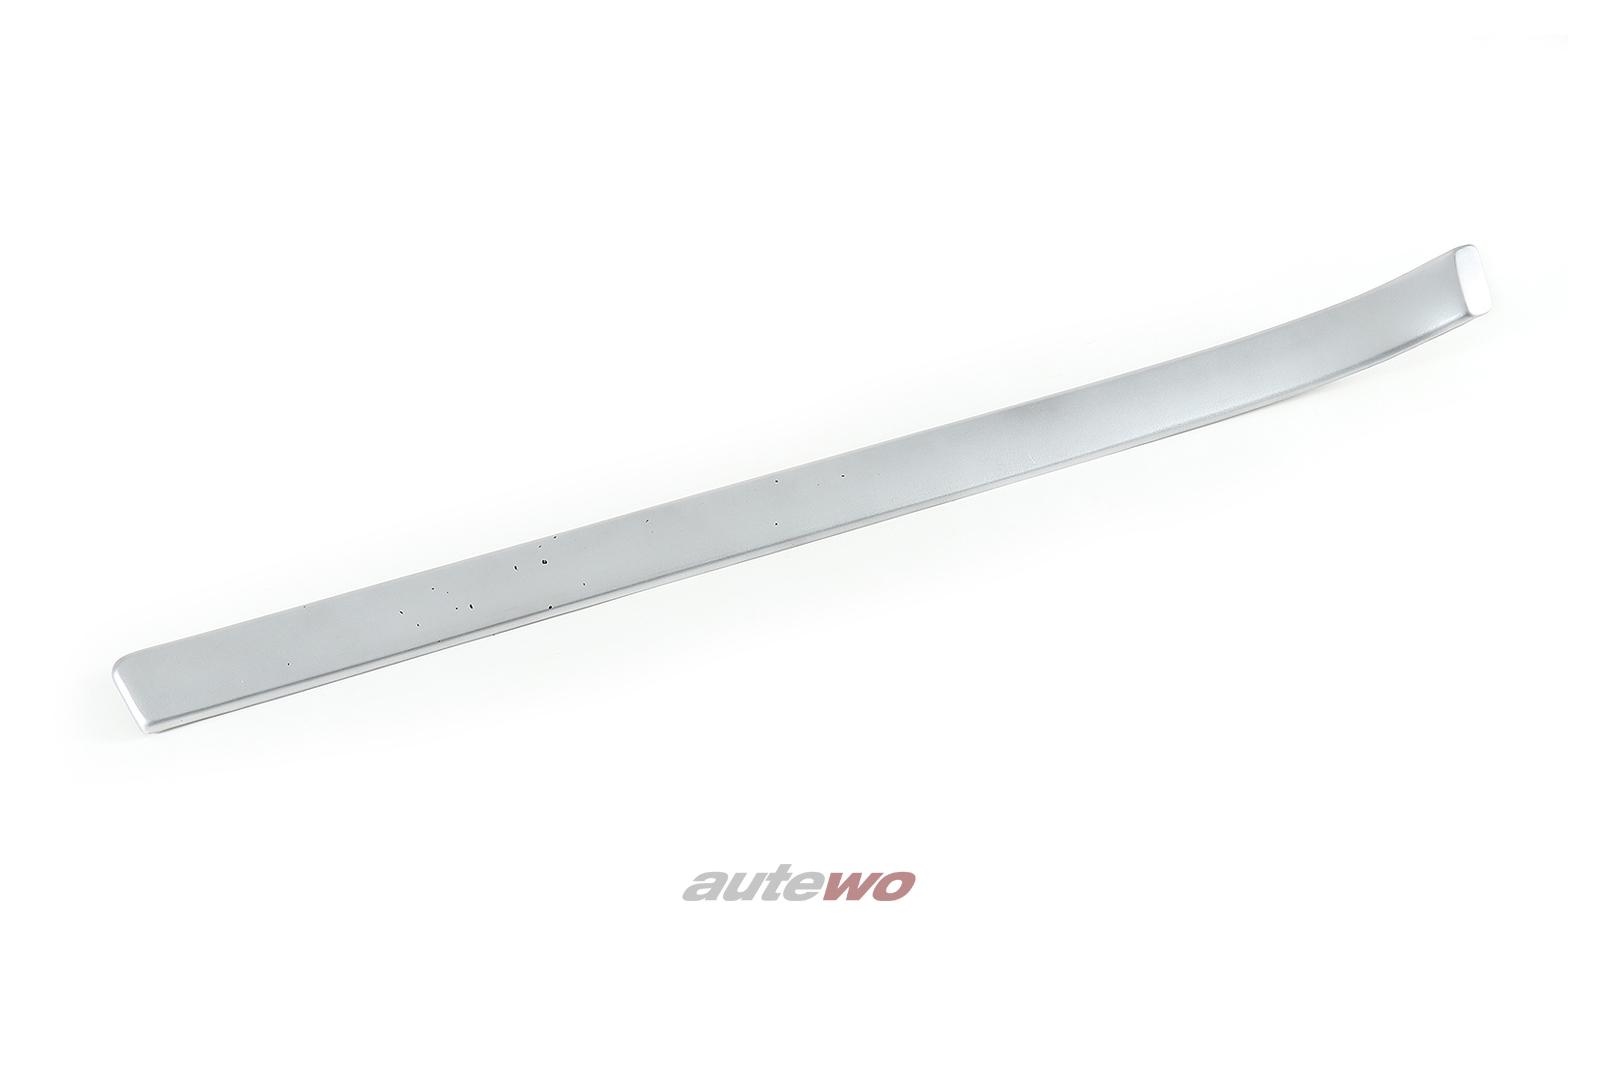 8D0867409 Audi A4/S4/RS4 B5 Dekorblende Türverkleidung Vorne Links silber